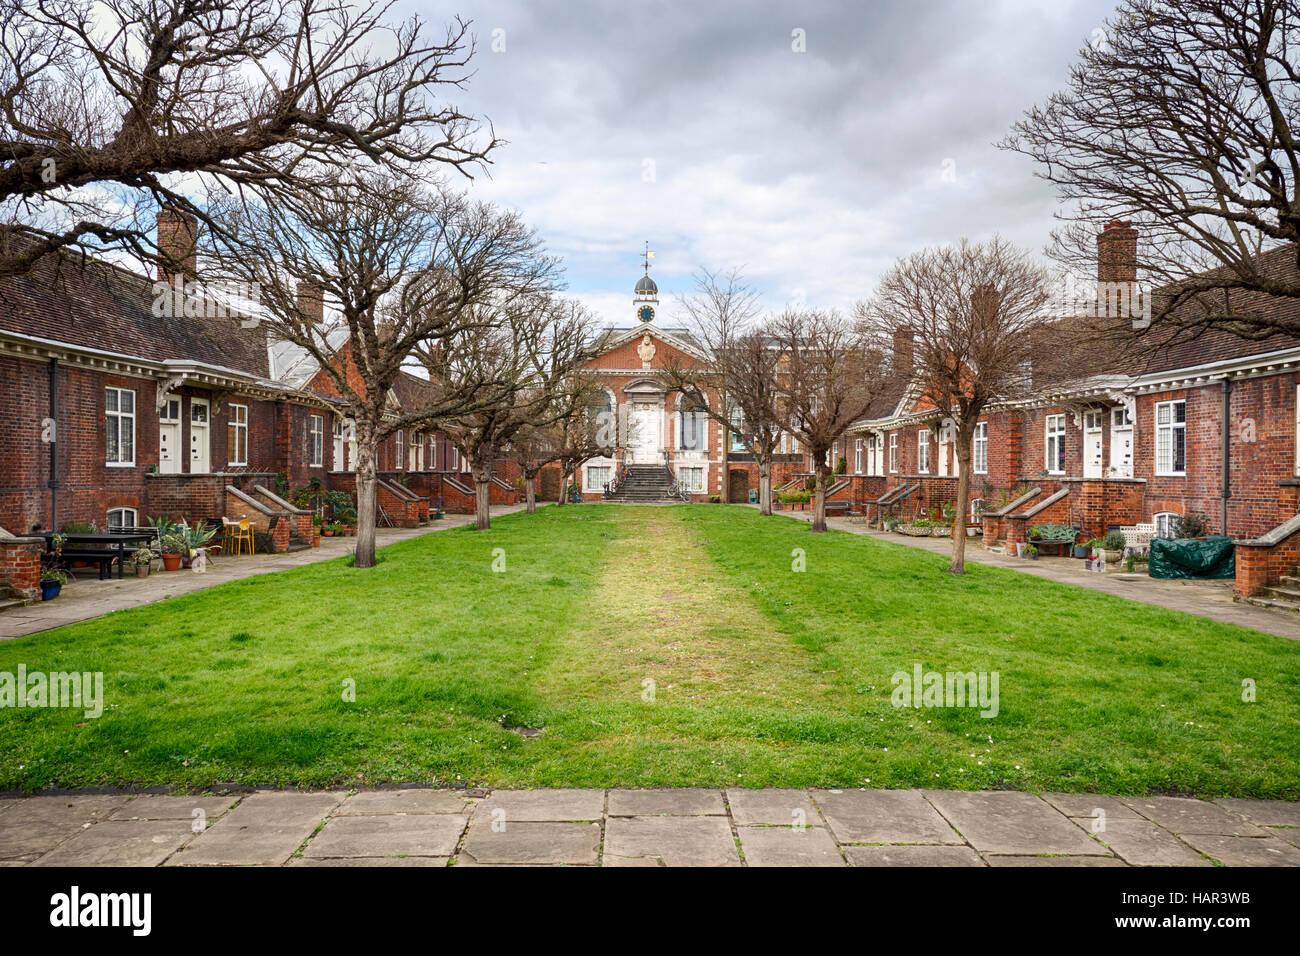 Trinity grün Almosen Häuser Mile End London im Jahre 1695 erbaut Stockfoto